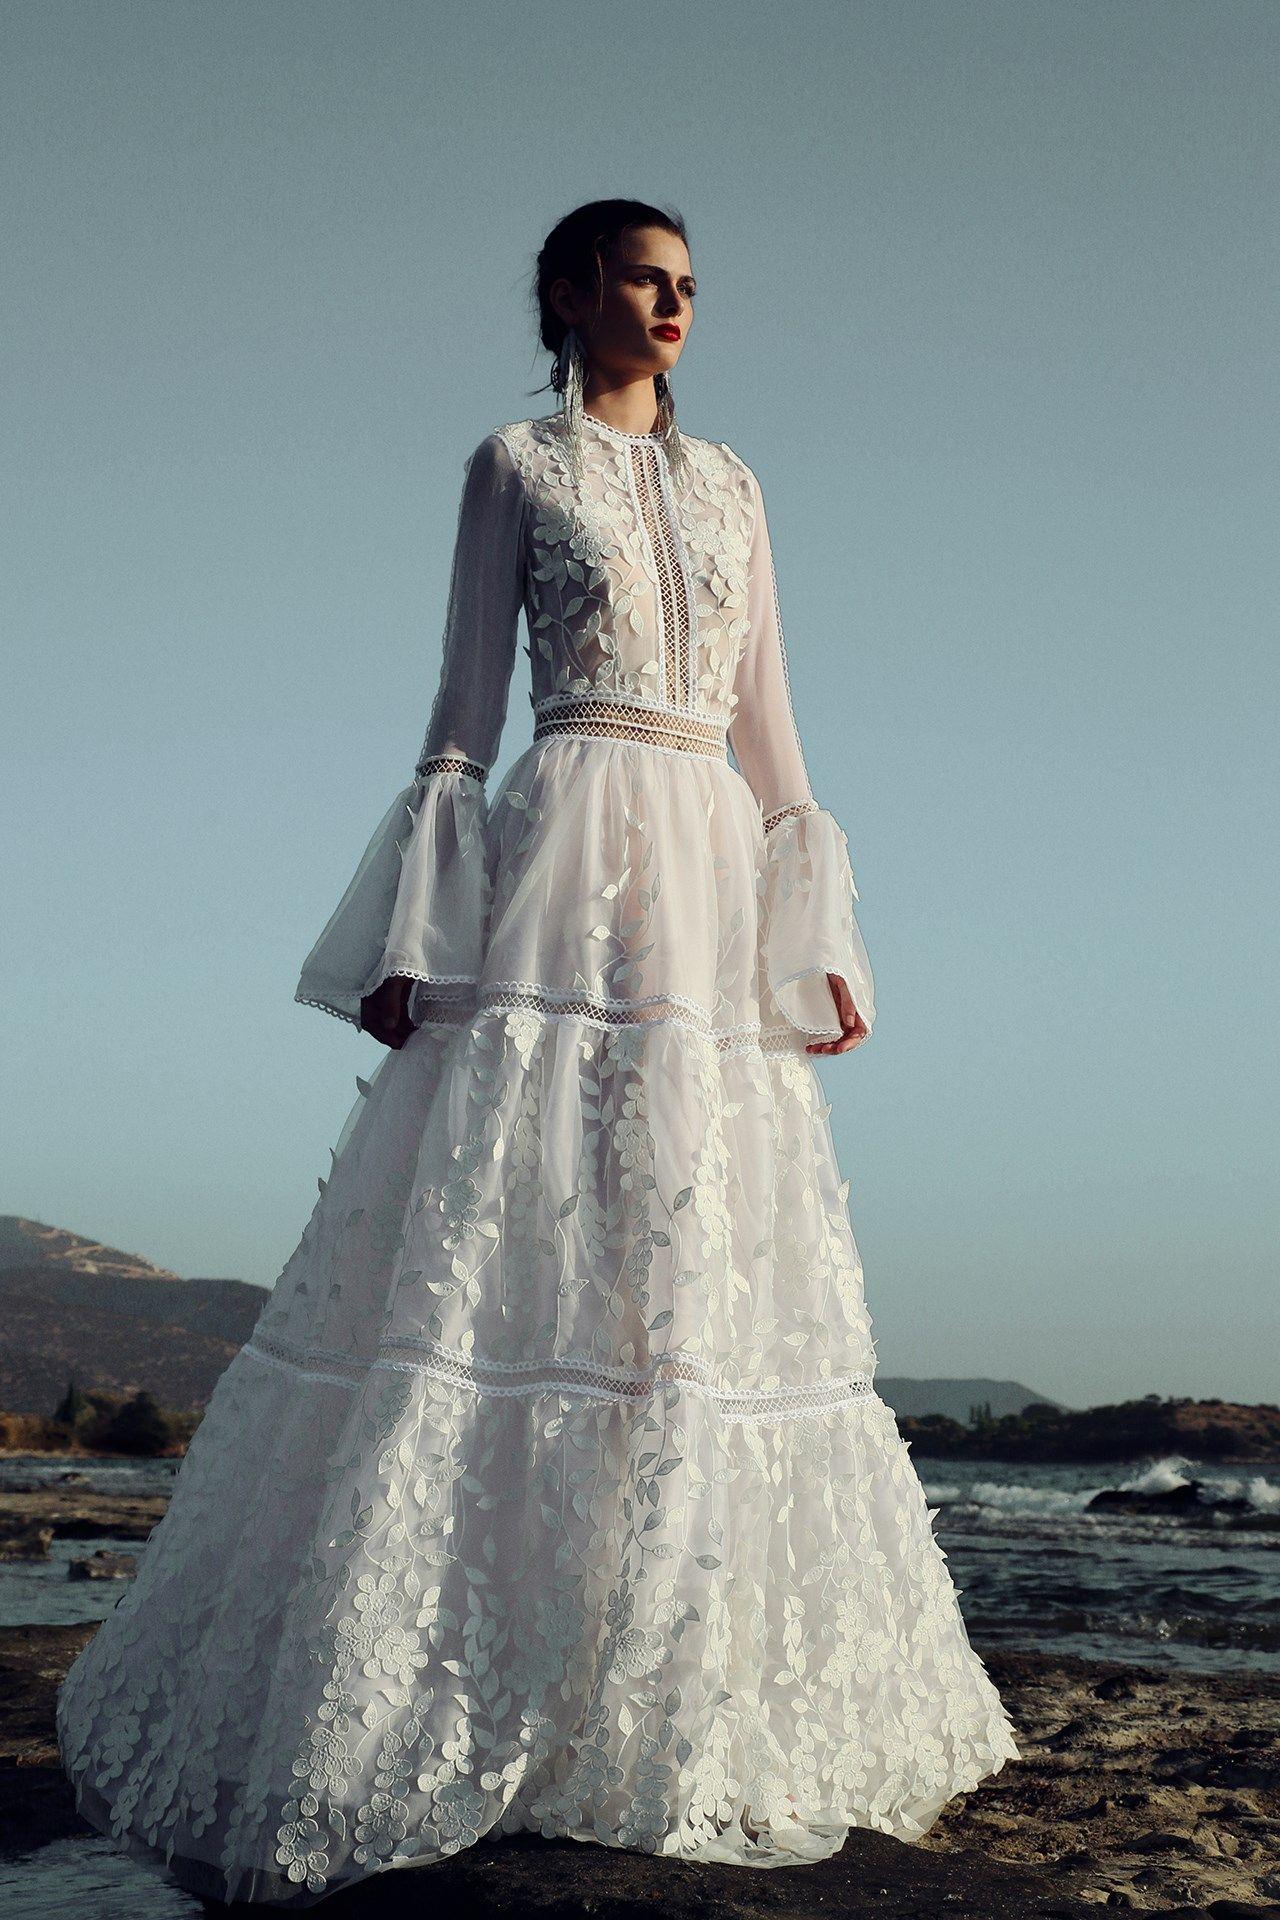 winter wedding dresses longmaximidi dresses pinterest